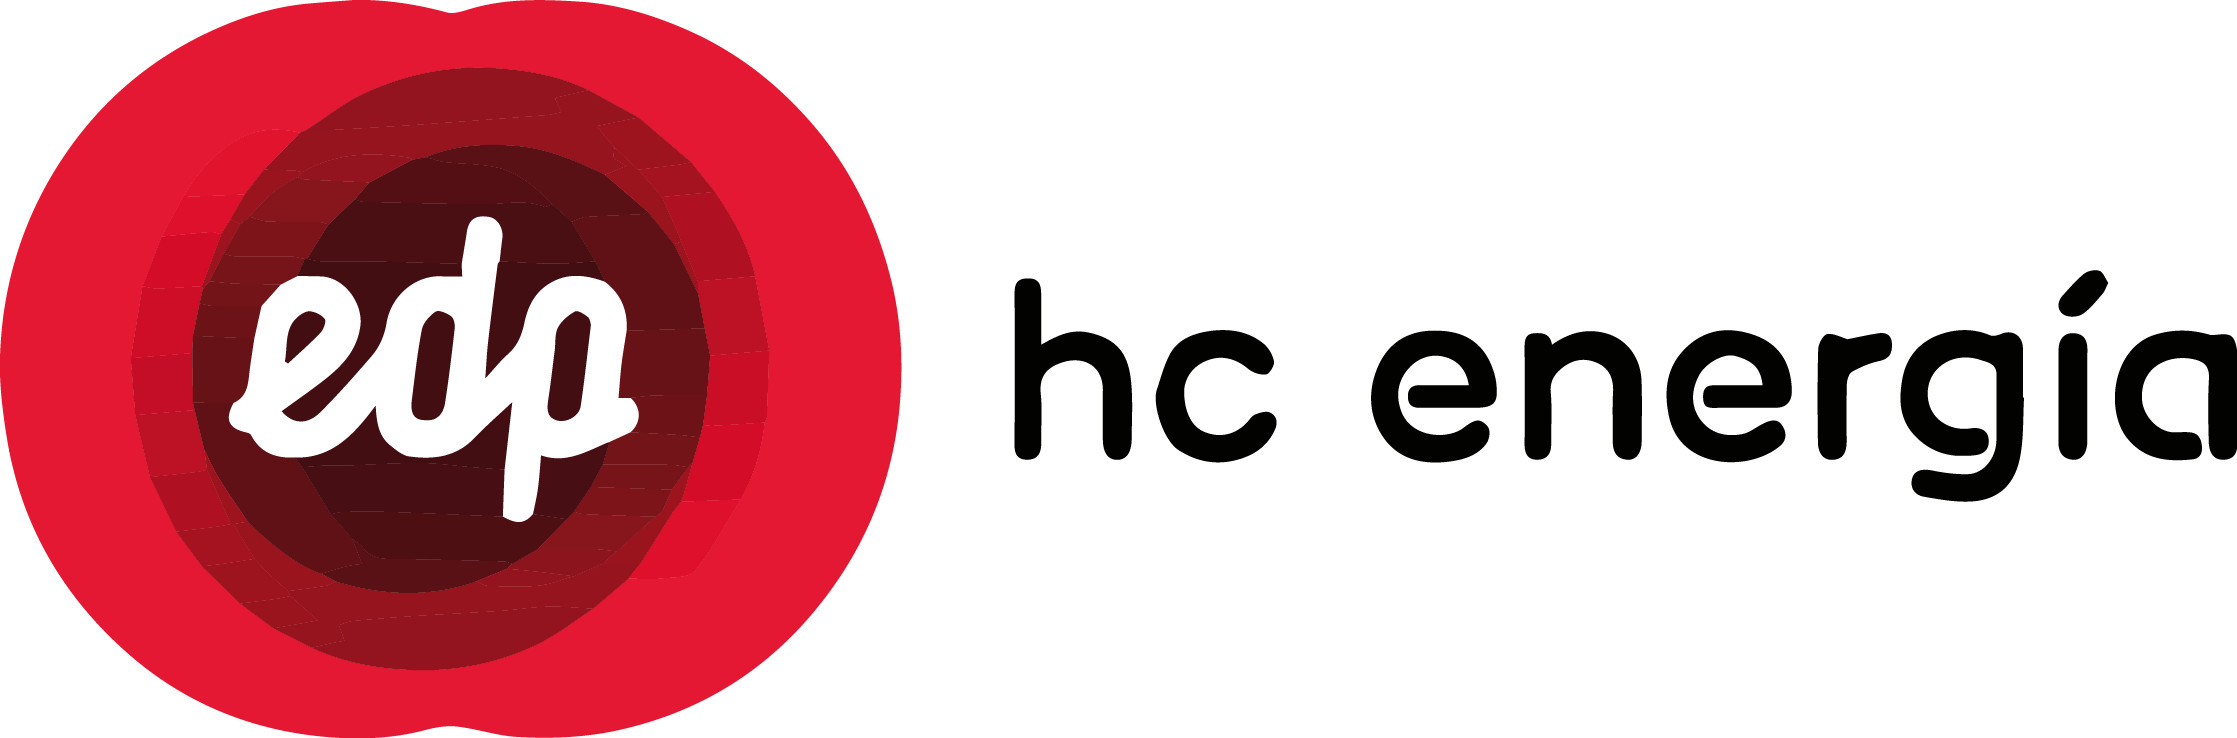 EDP HC Energía